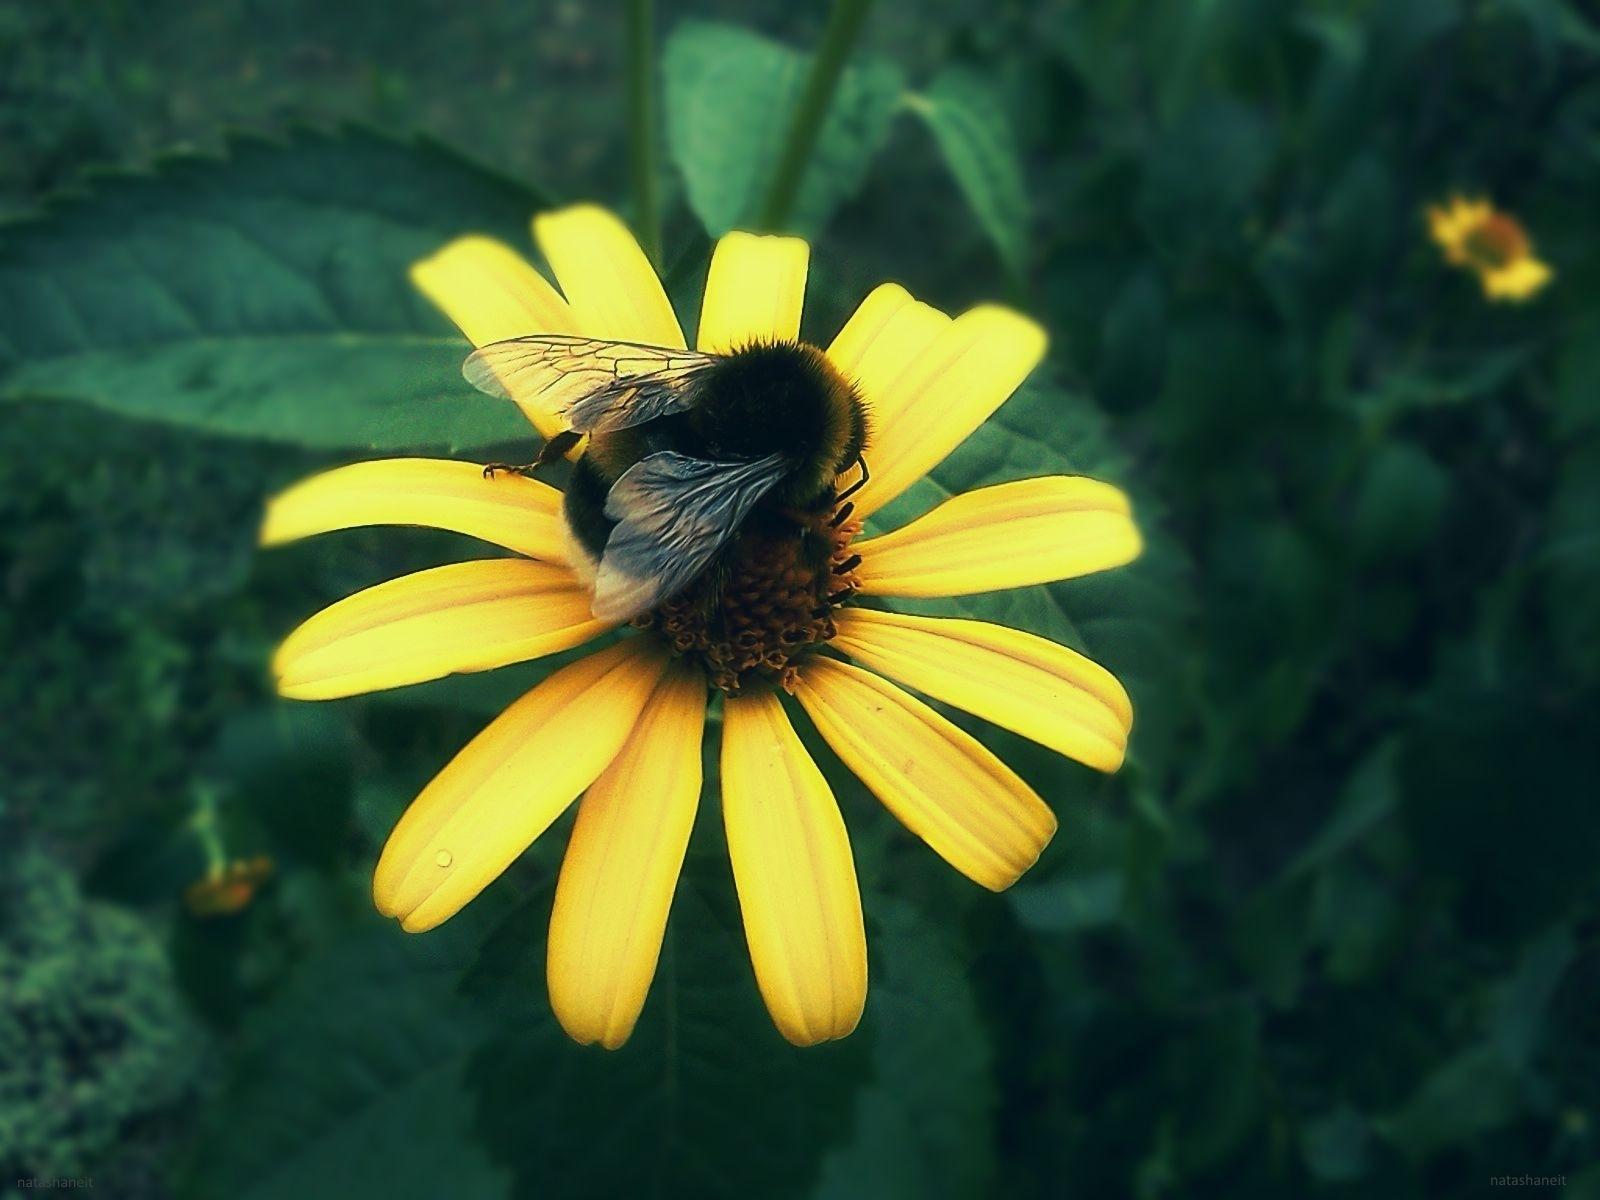 Yellow daisy and bumblebee by natashaneit